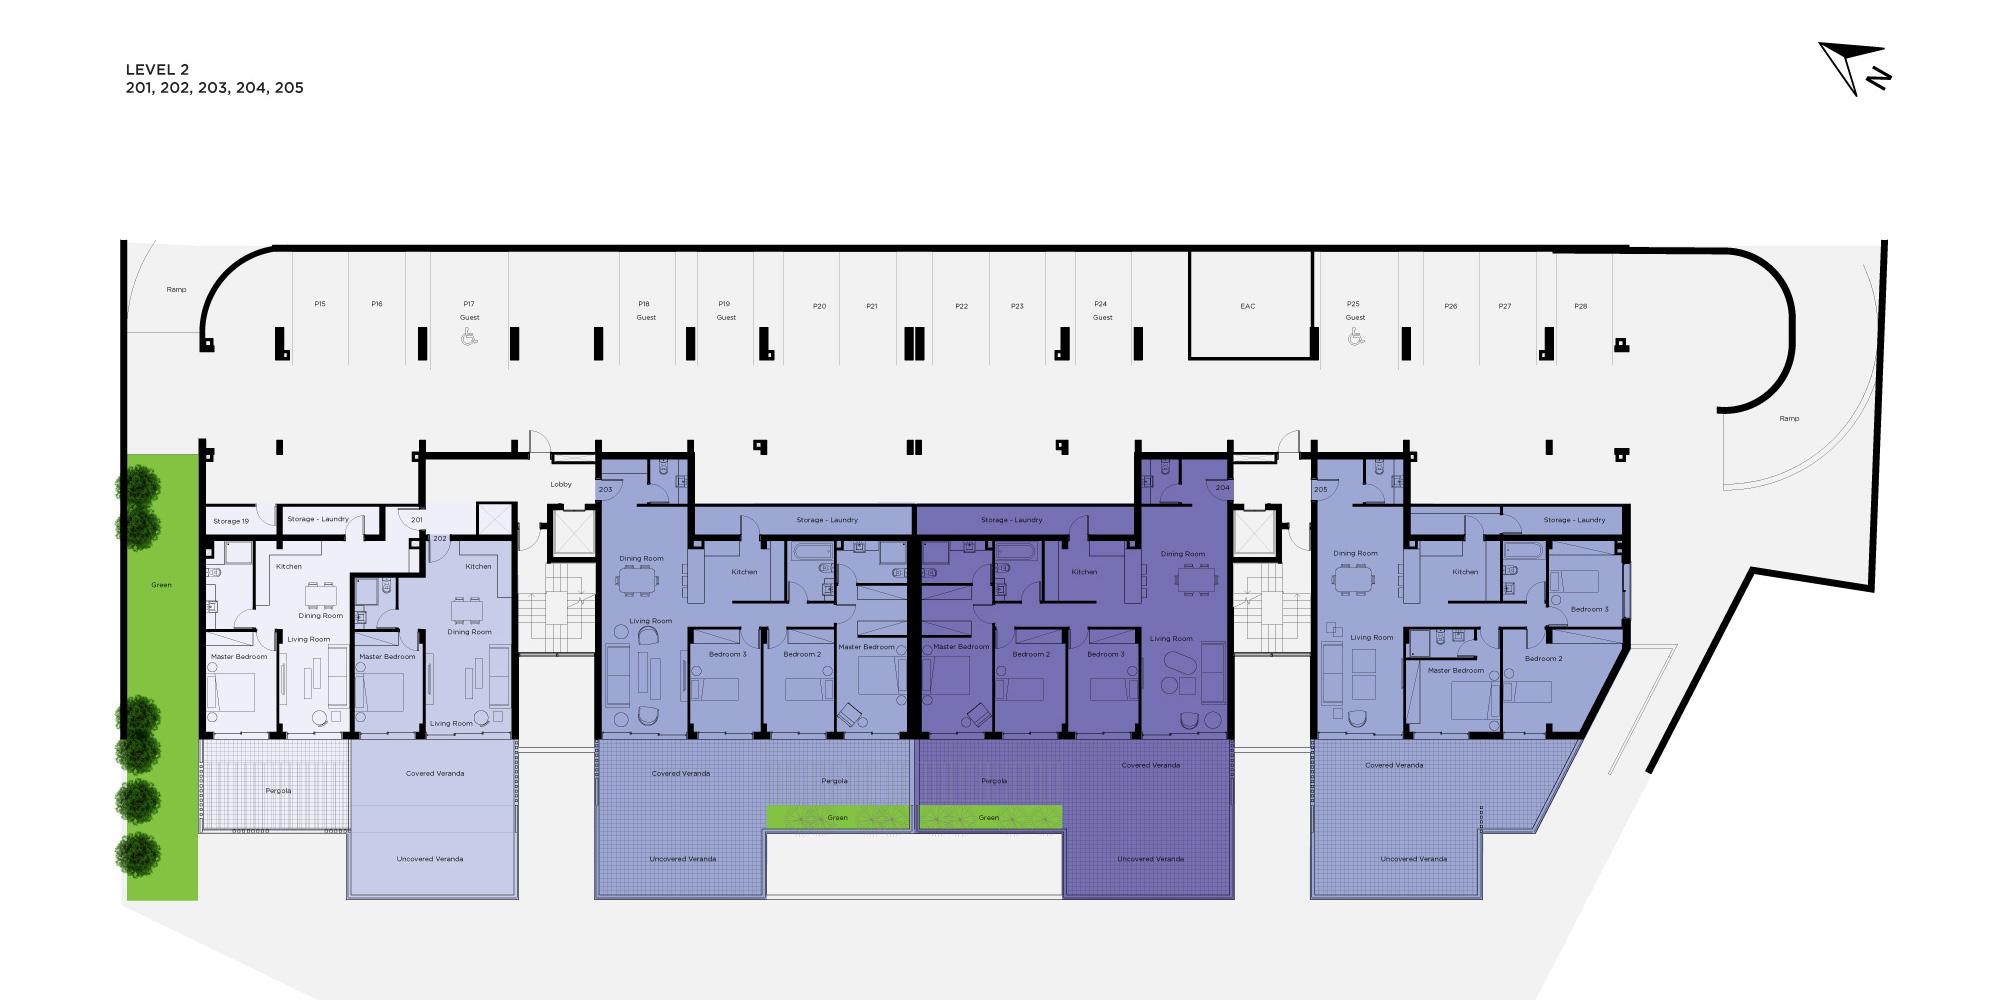 pantheon hill level 2 floorplan